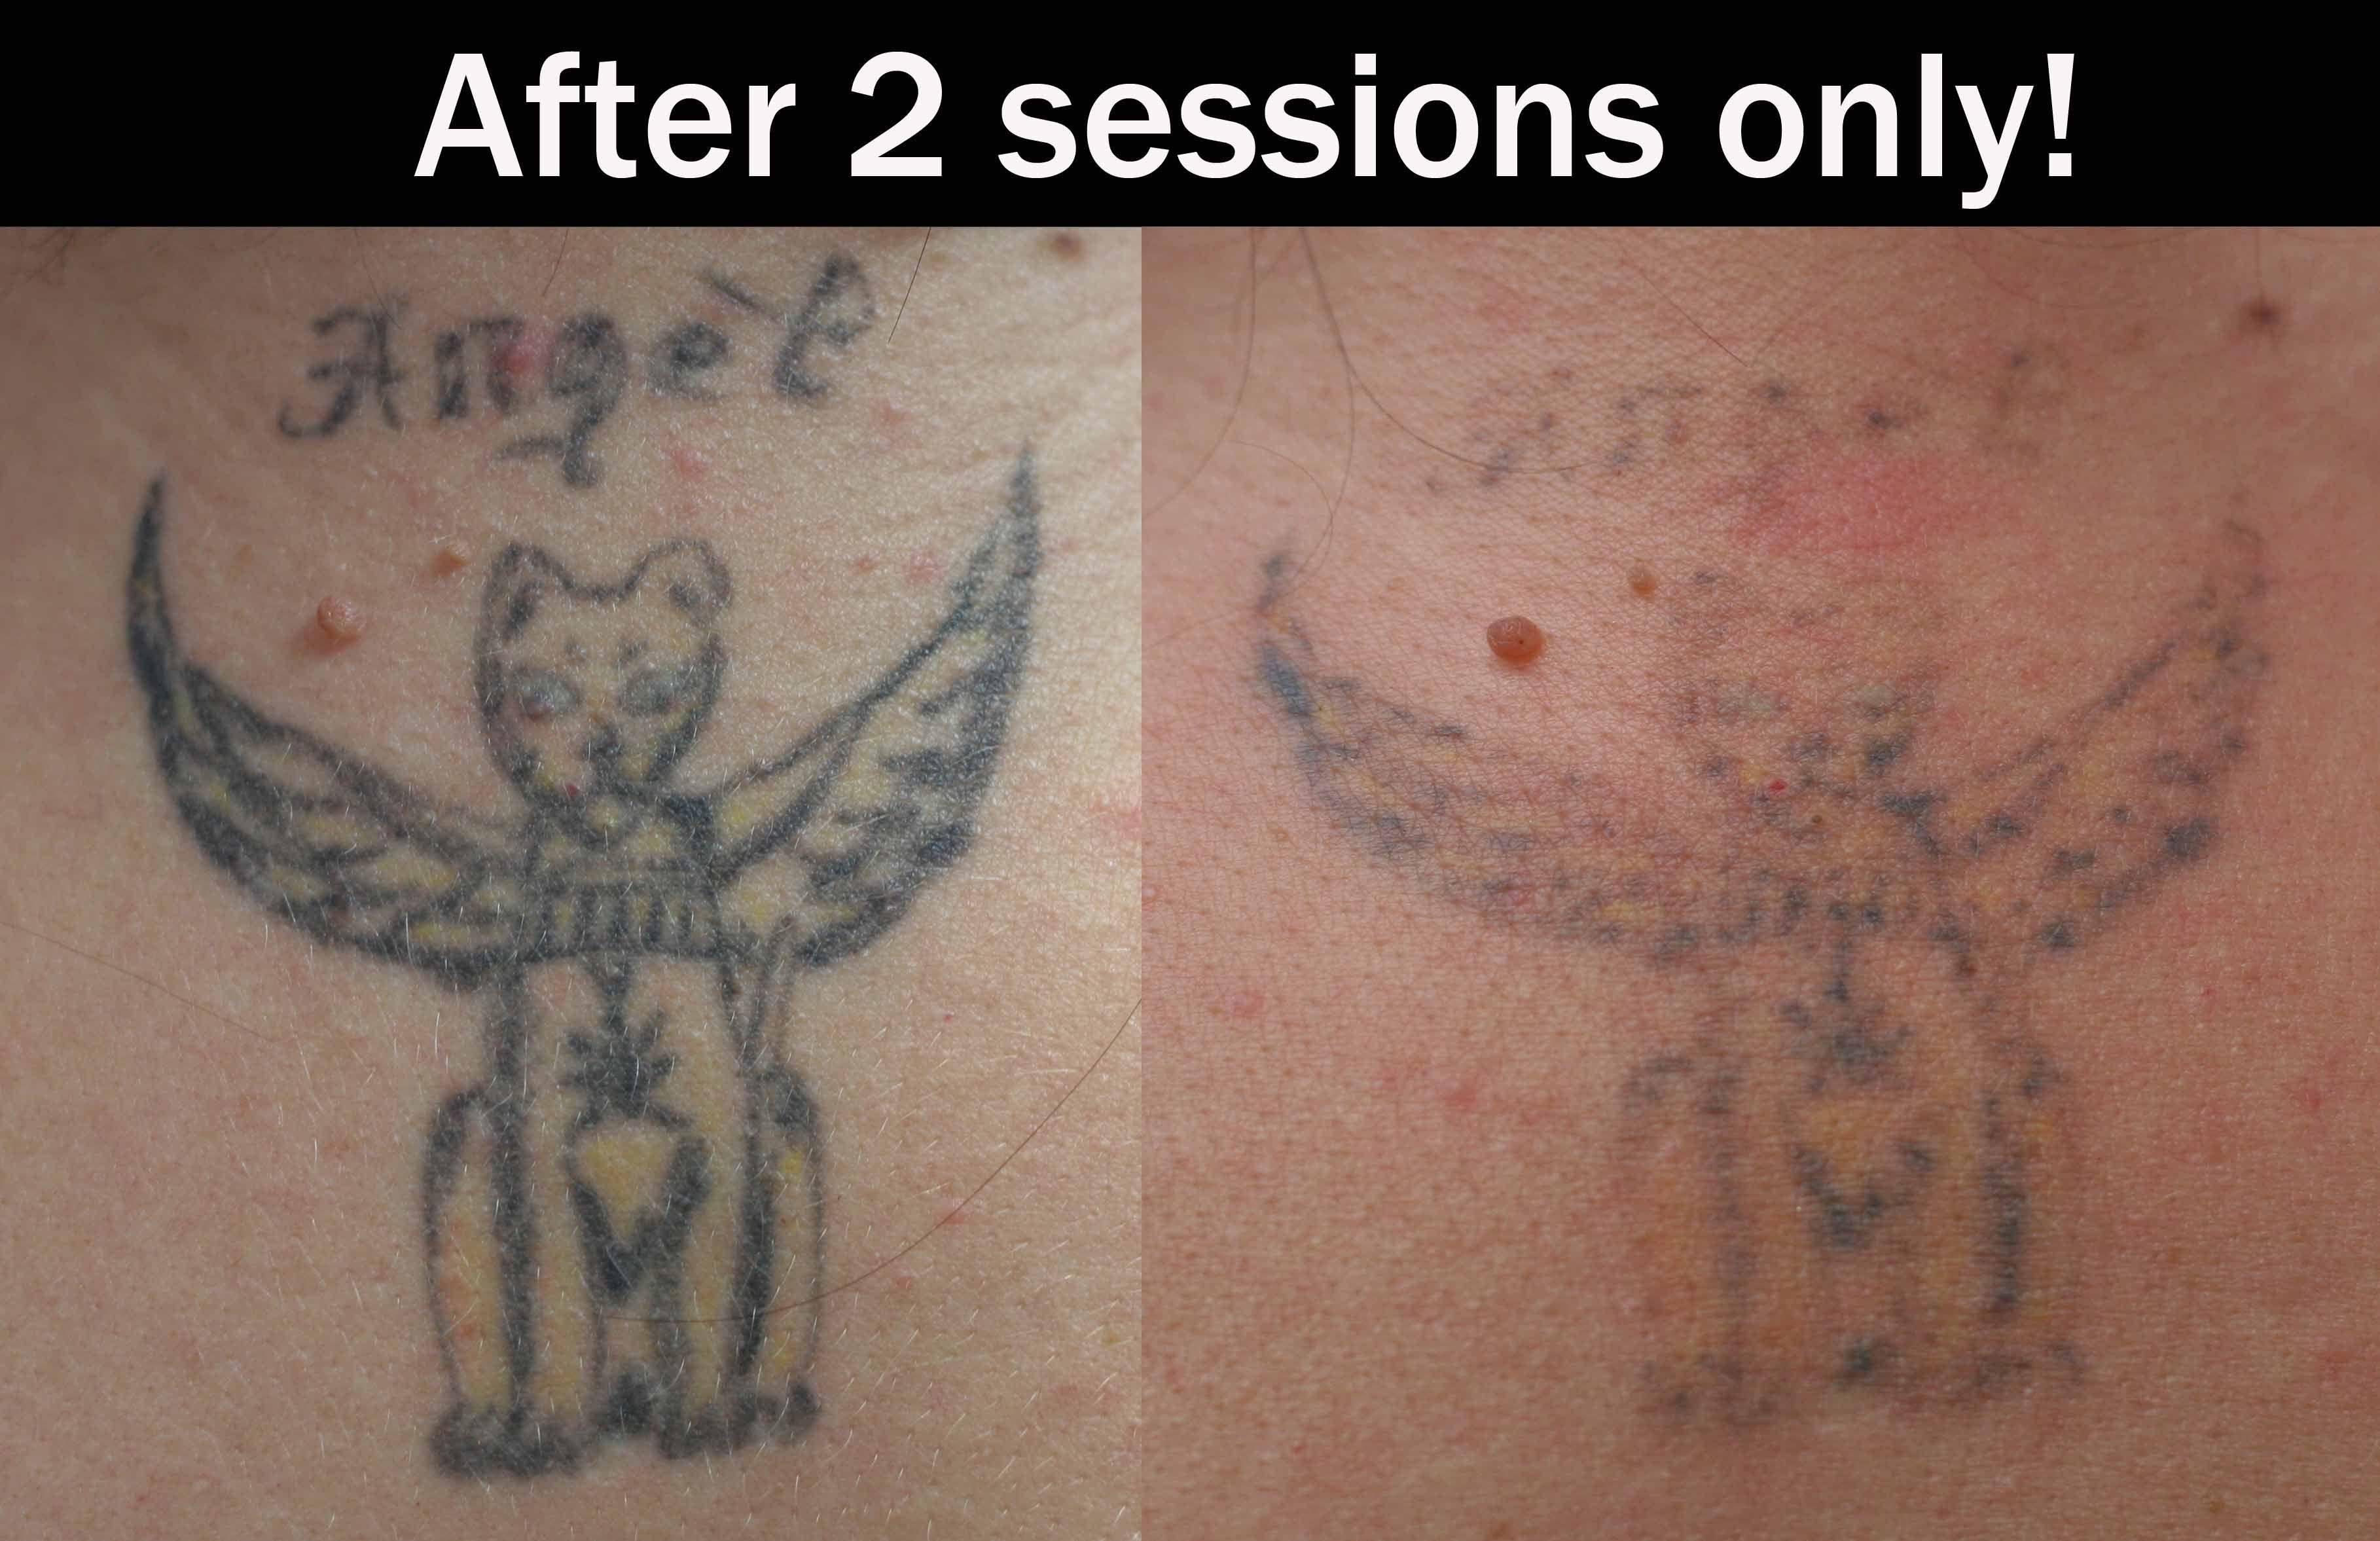 Laser Tattoo Removal « Eternal-Art | Laser tattoo